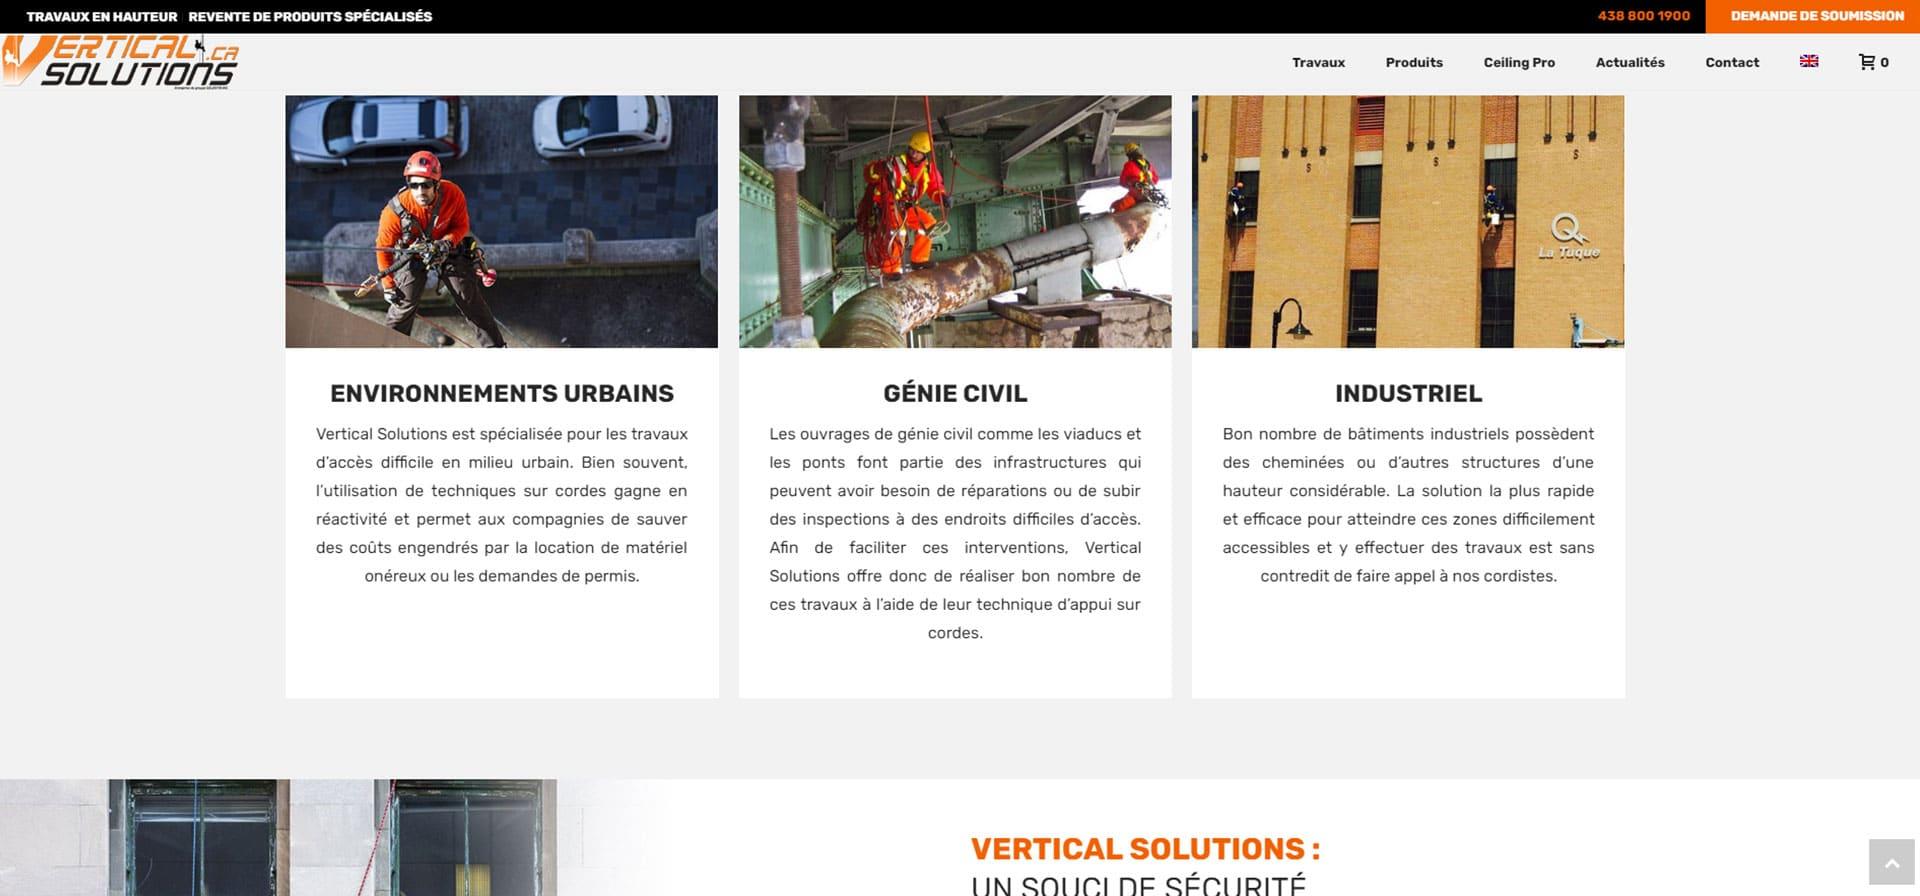 vertical-solutions-4.jpg